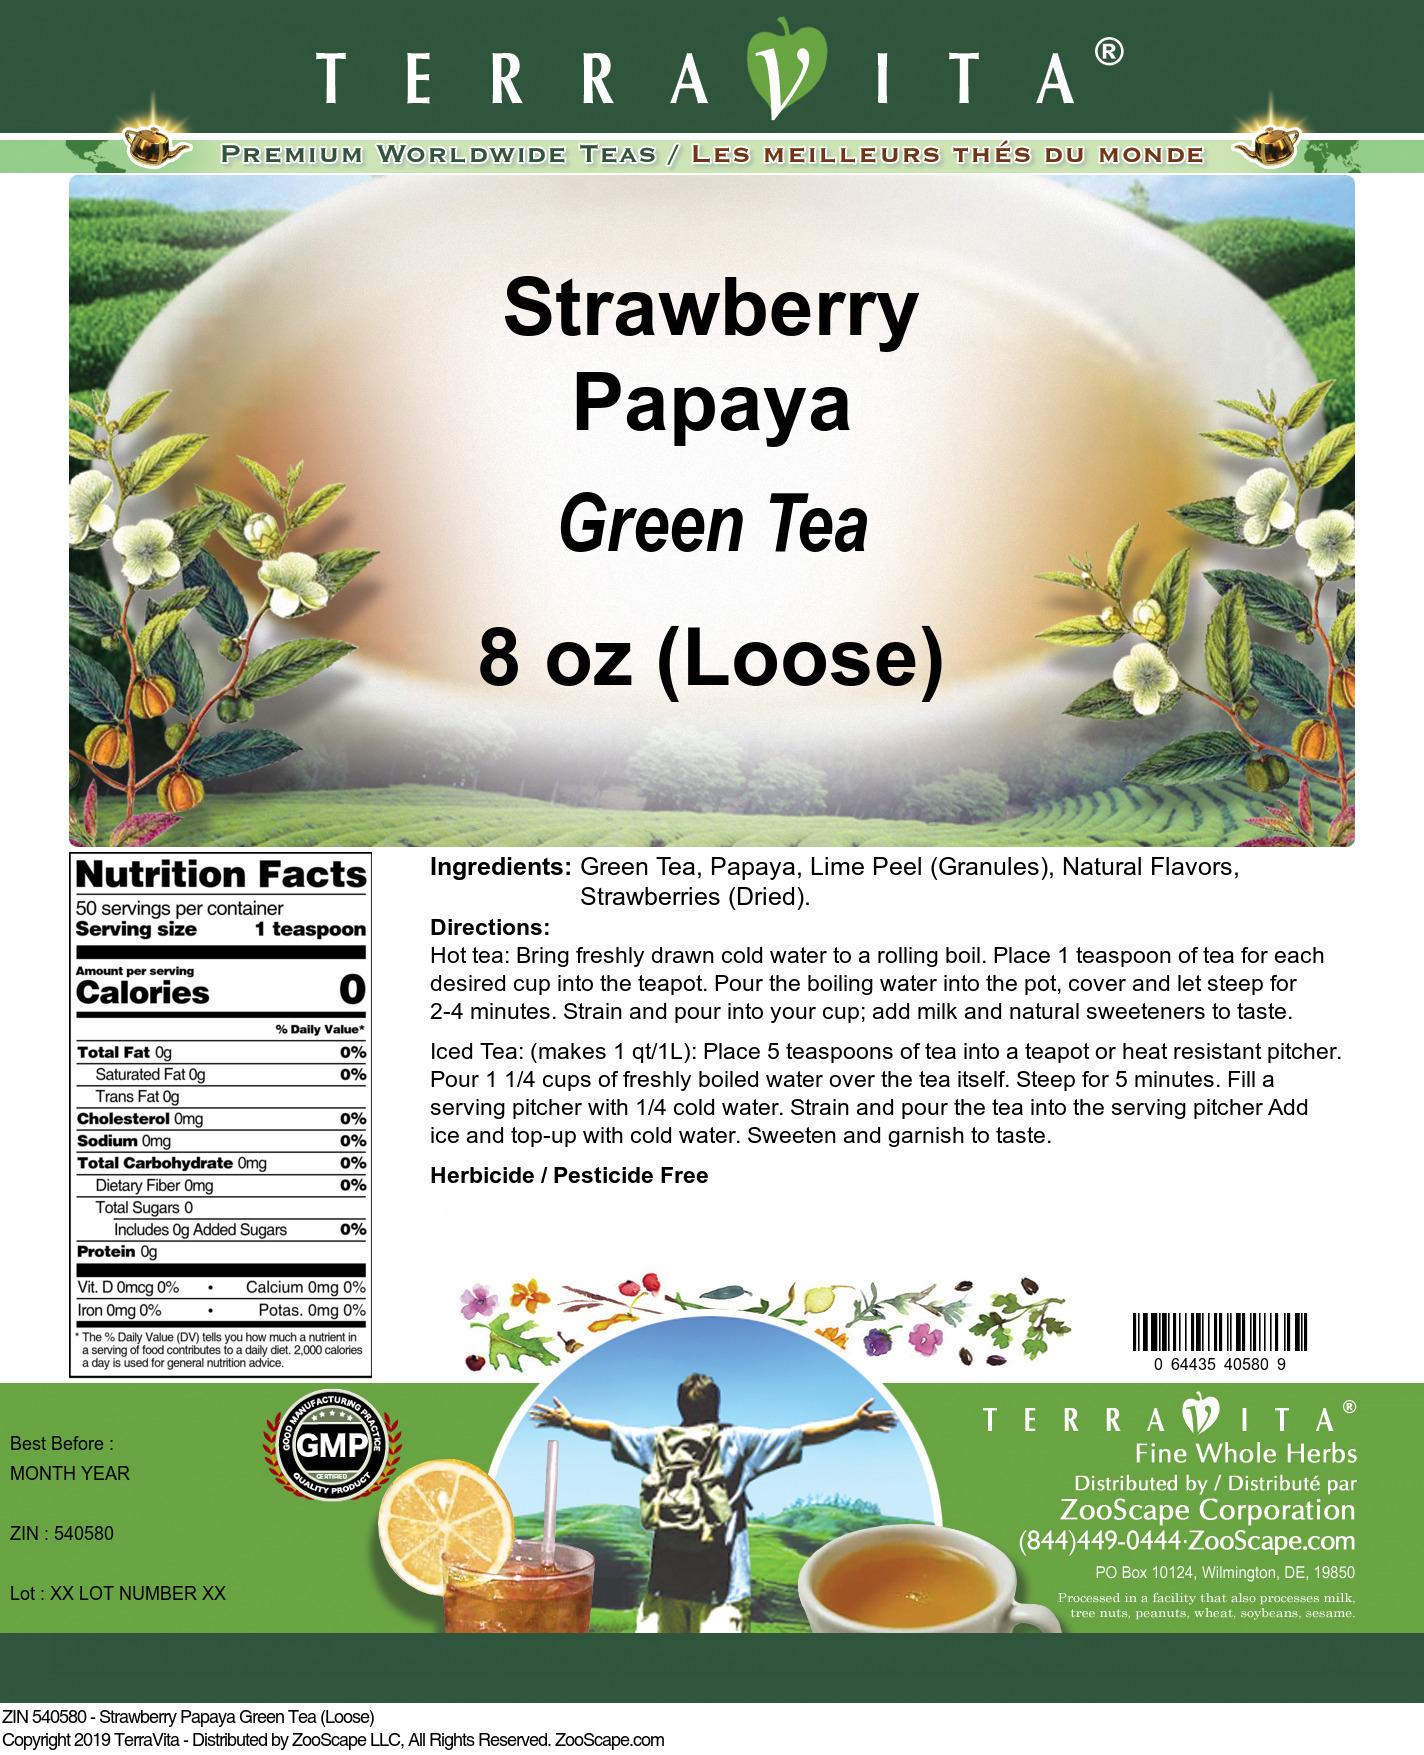 Strawberry Papaya Green Tea (Loose)